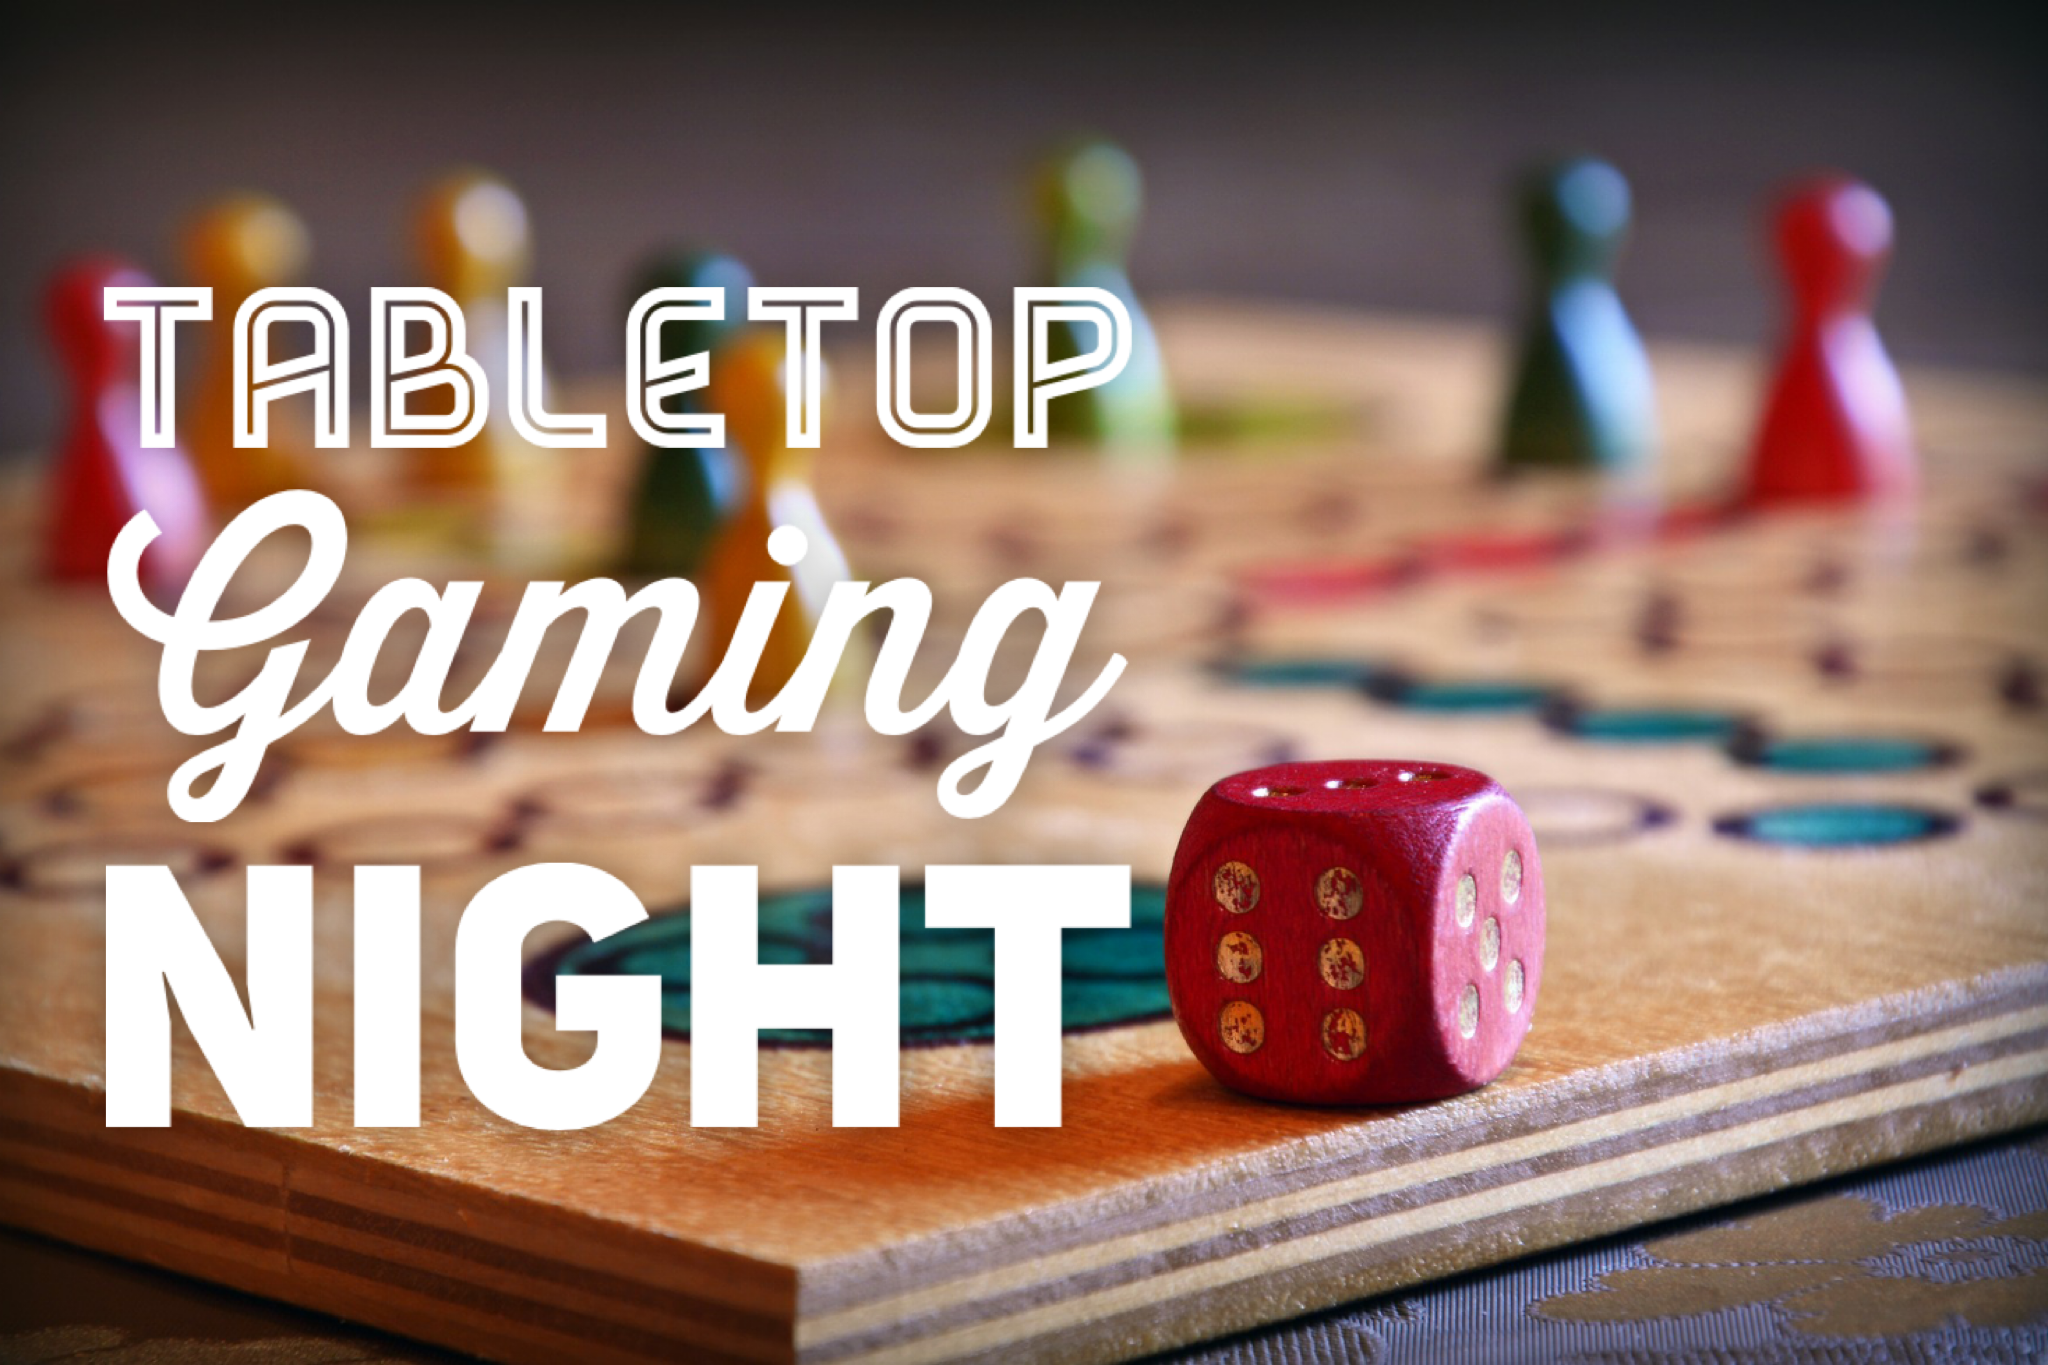 Tabletop Gaming Night